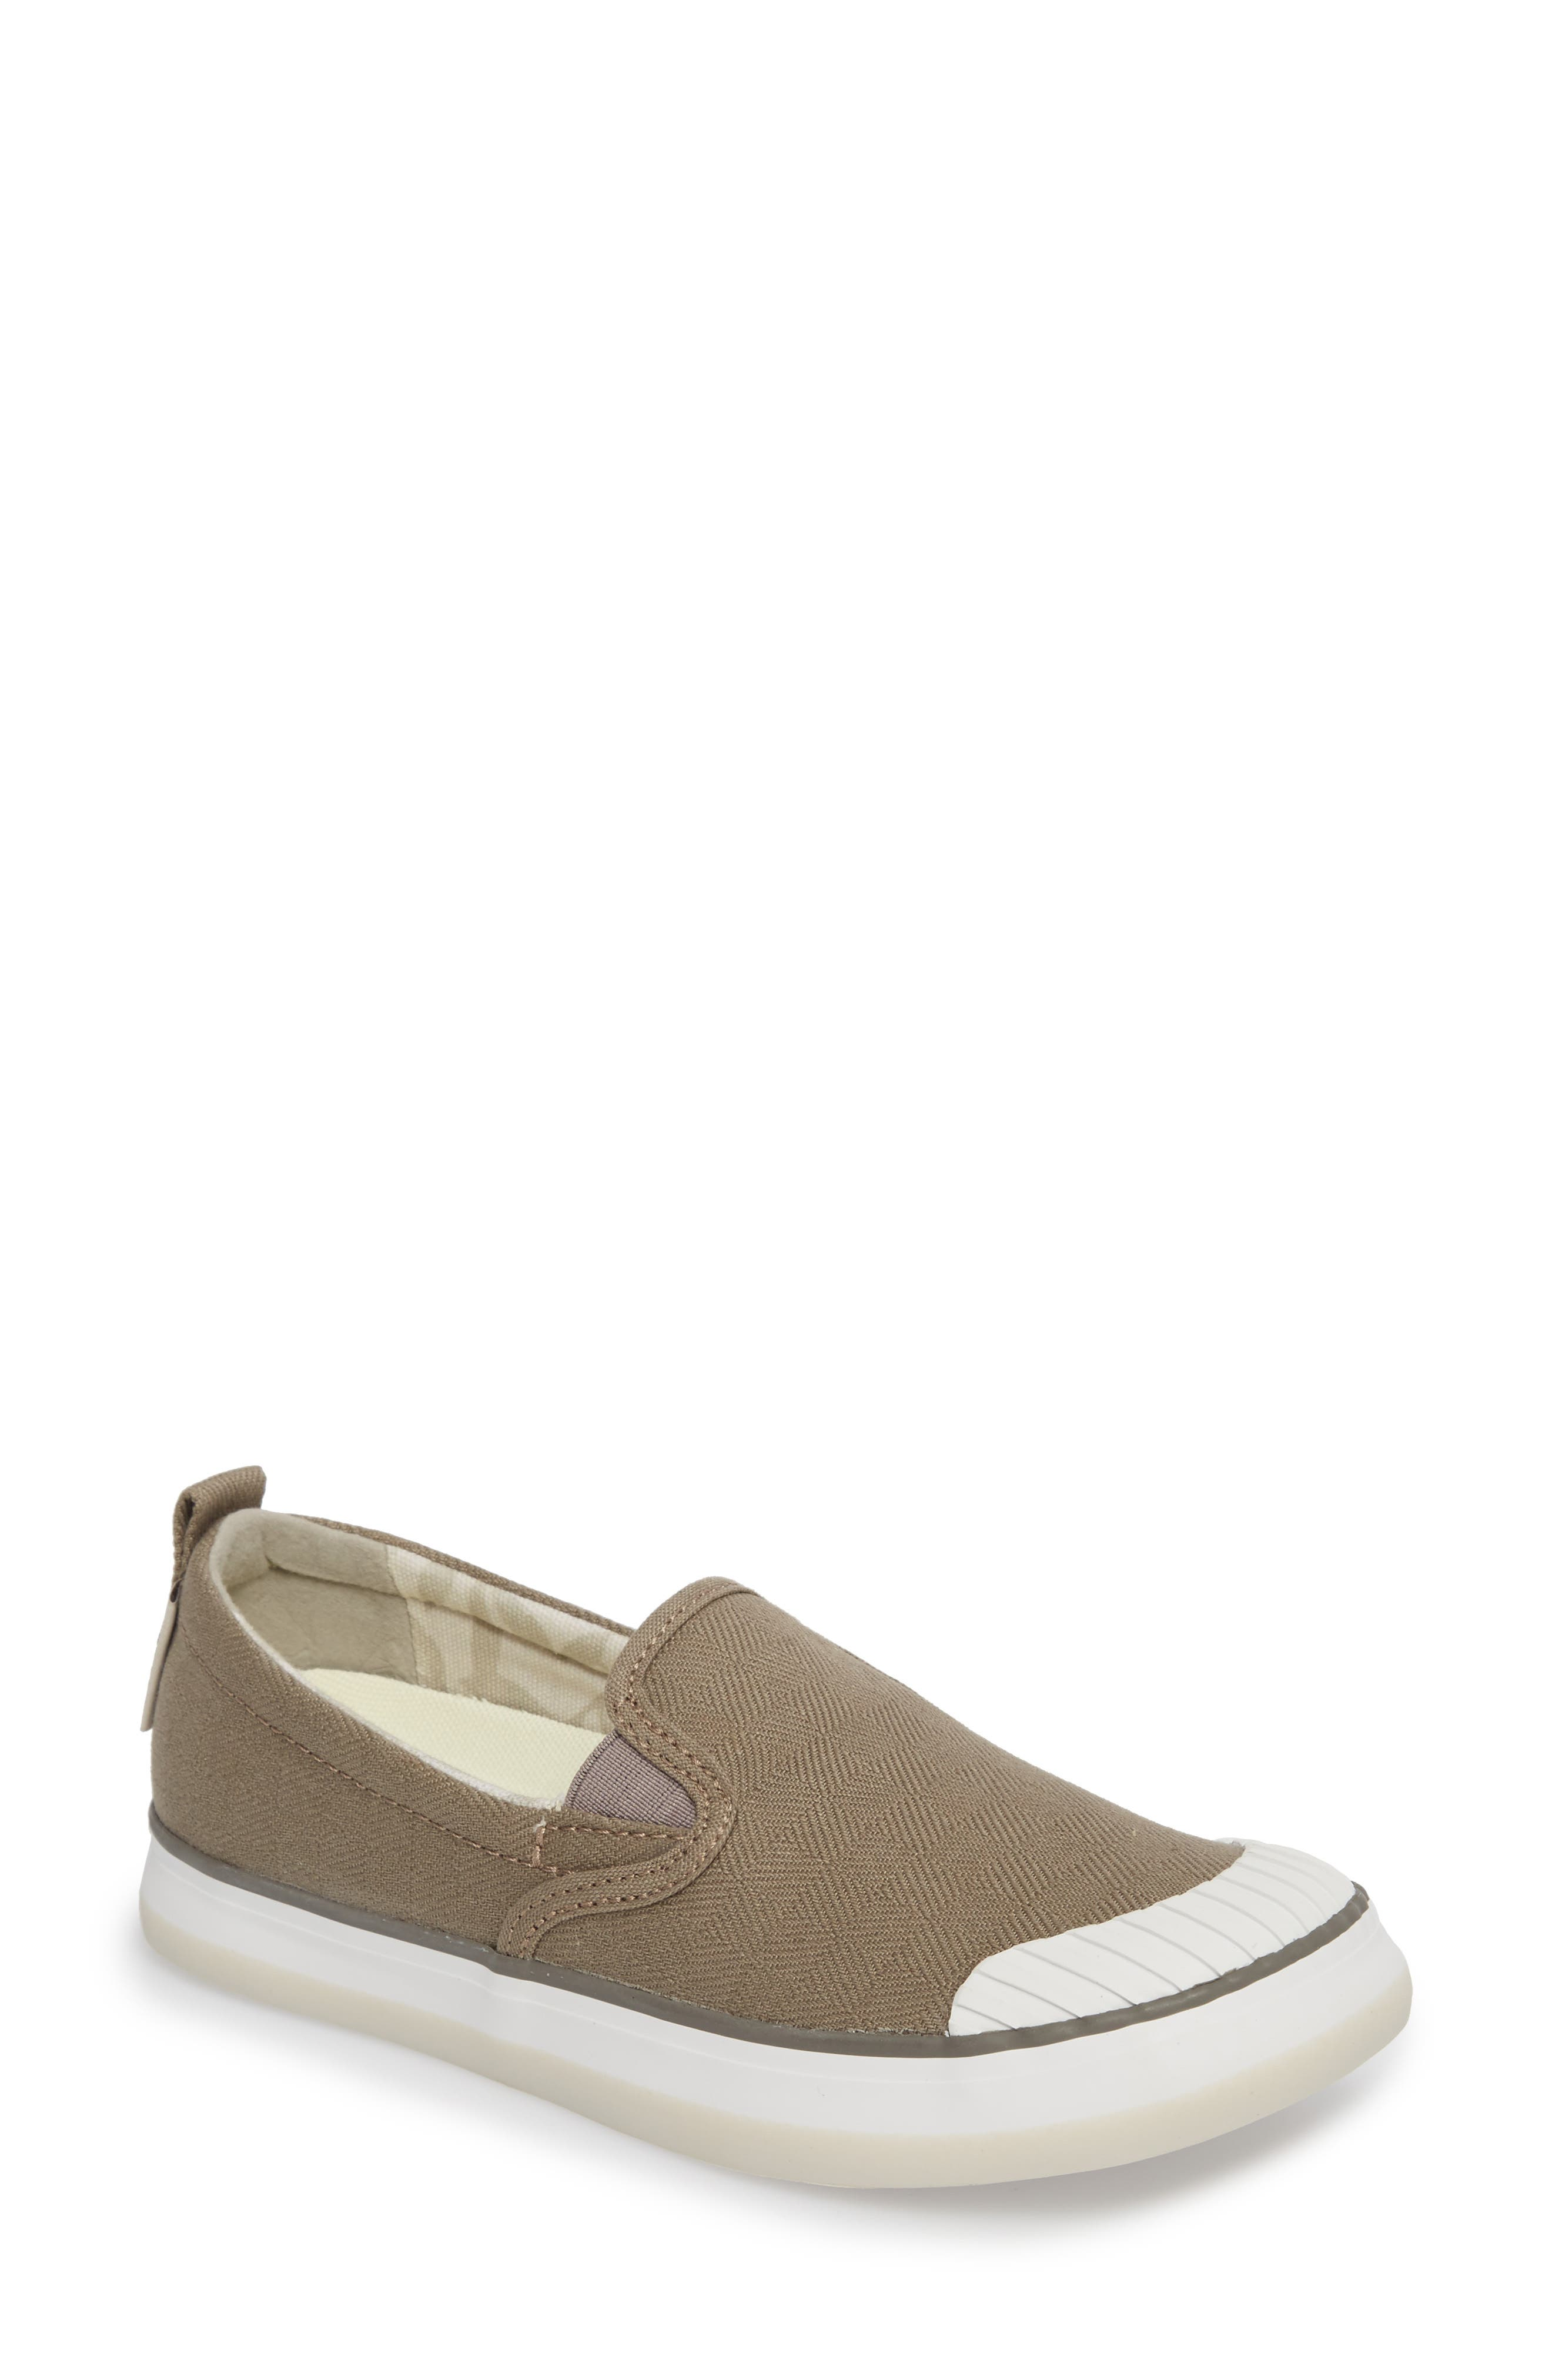 Elsa Slip-On Sneaker,                         Main,                         color, Brindle